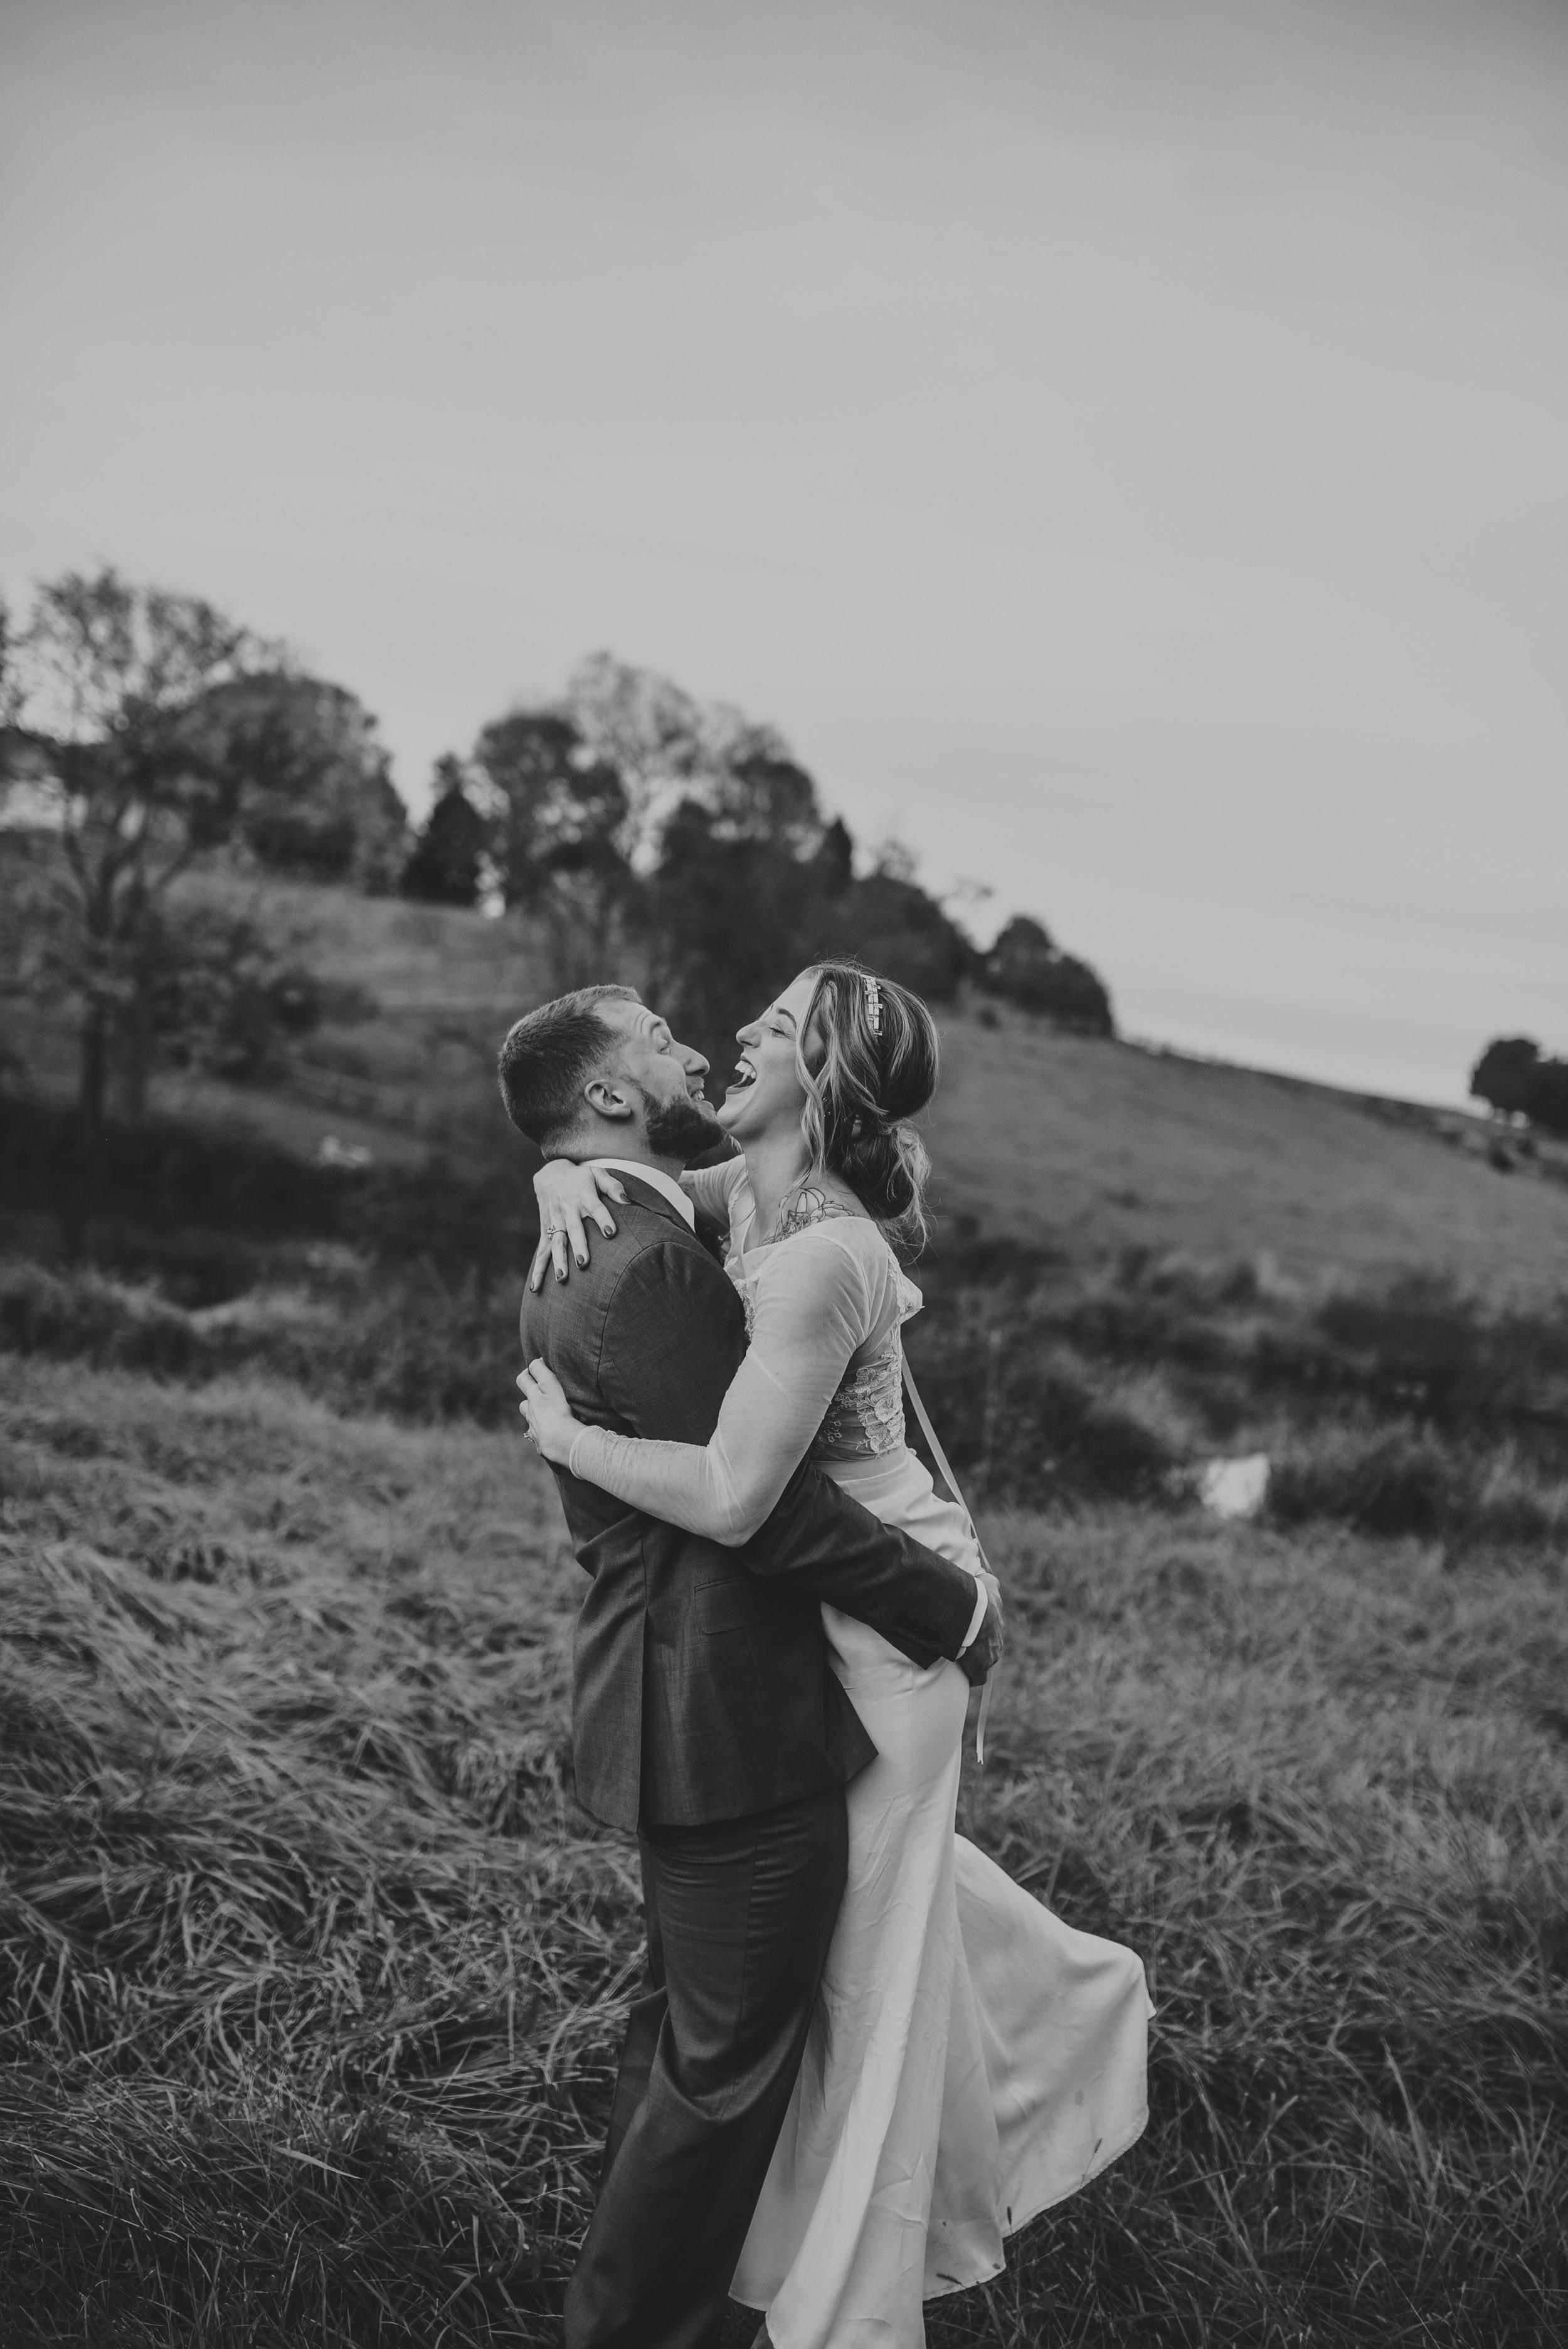 agpcollective_korn_coupleportraits-0656.jpg